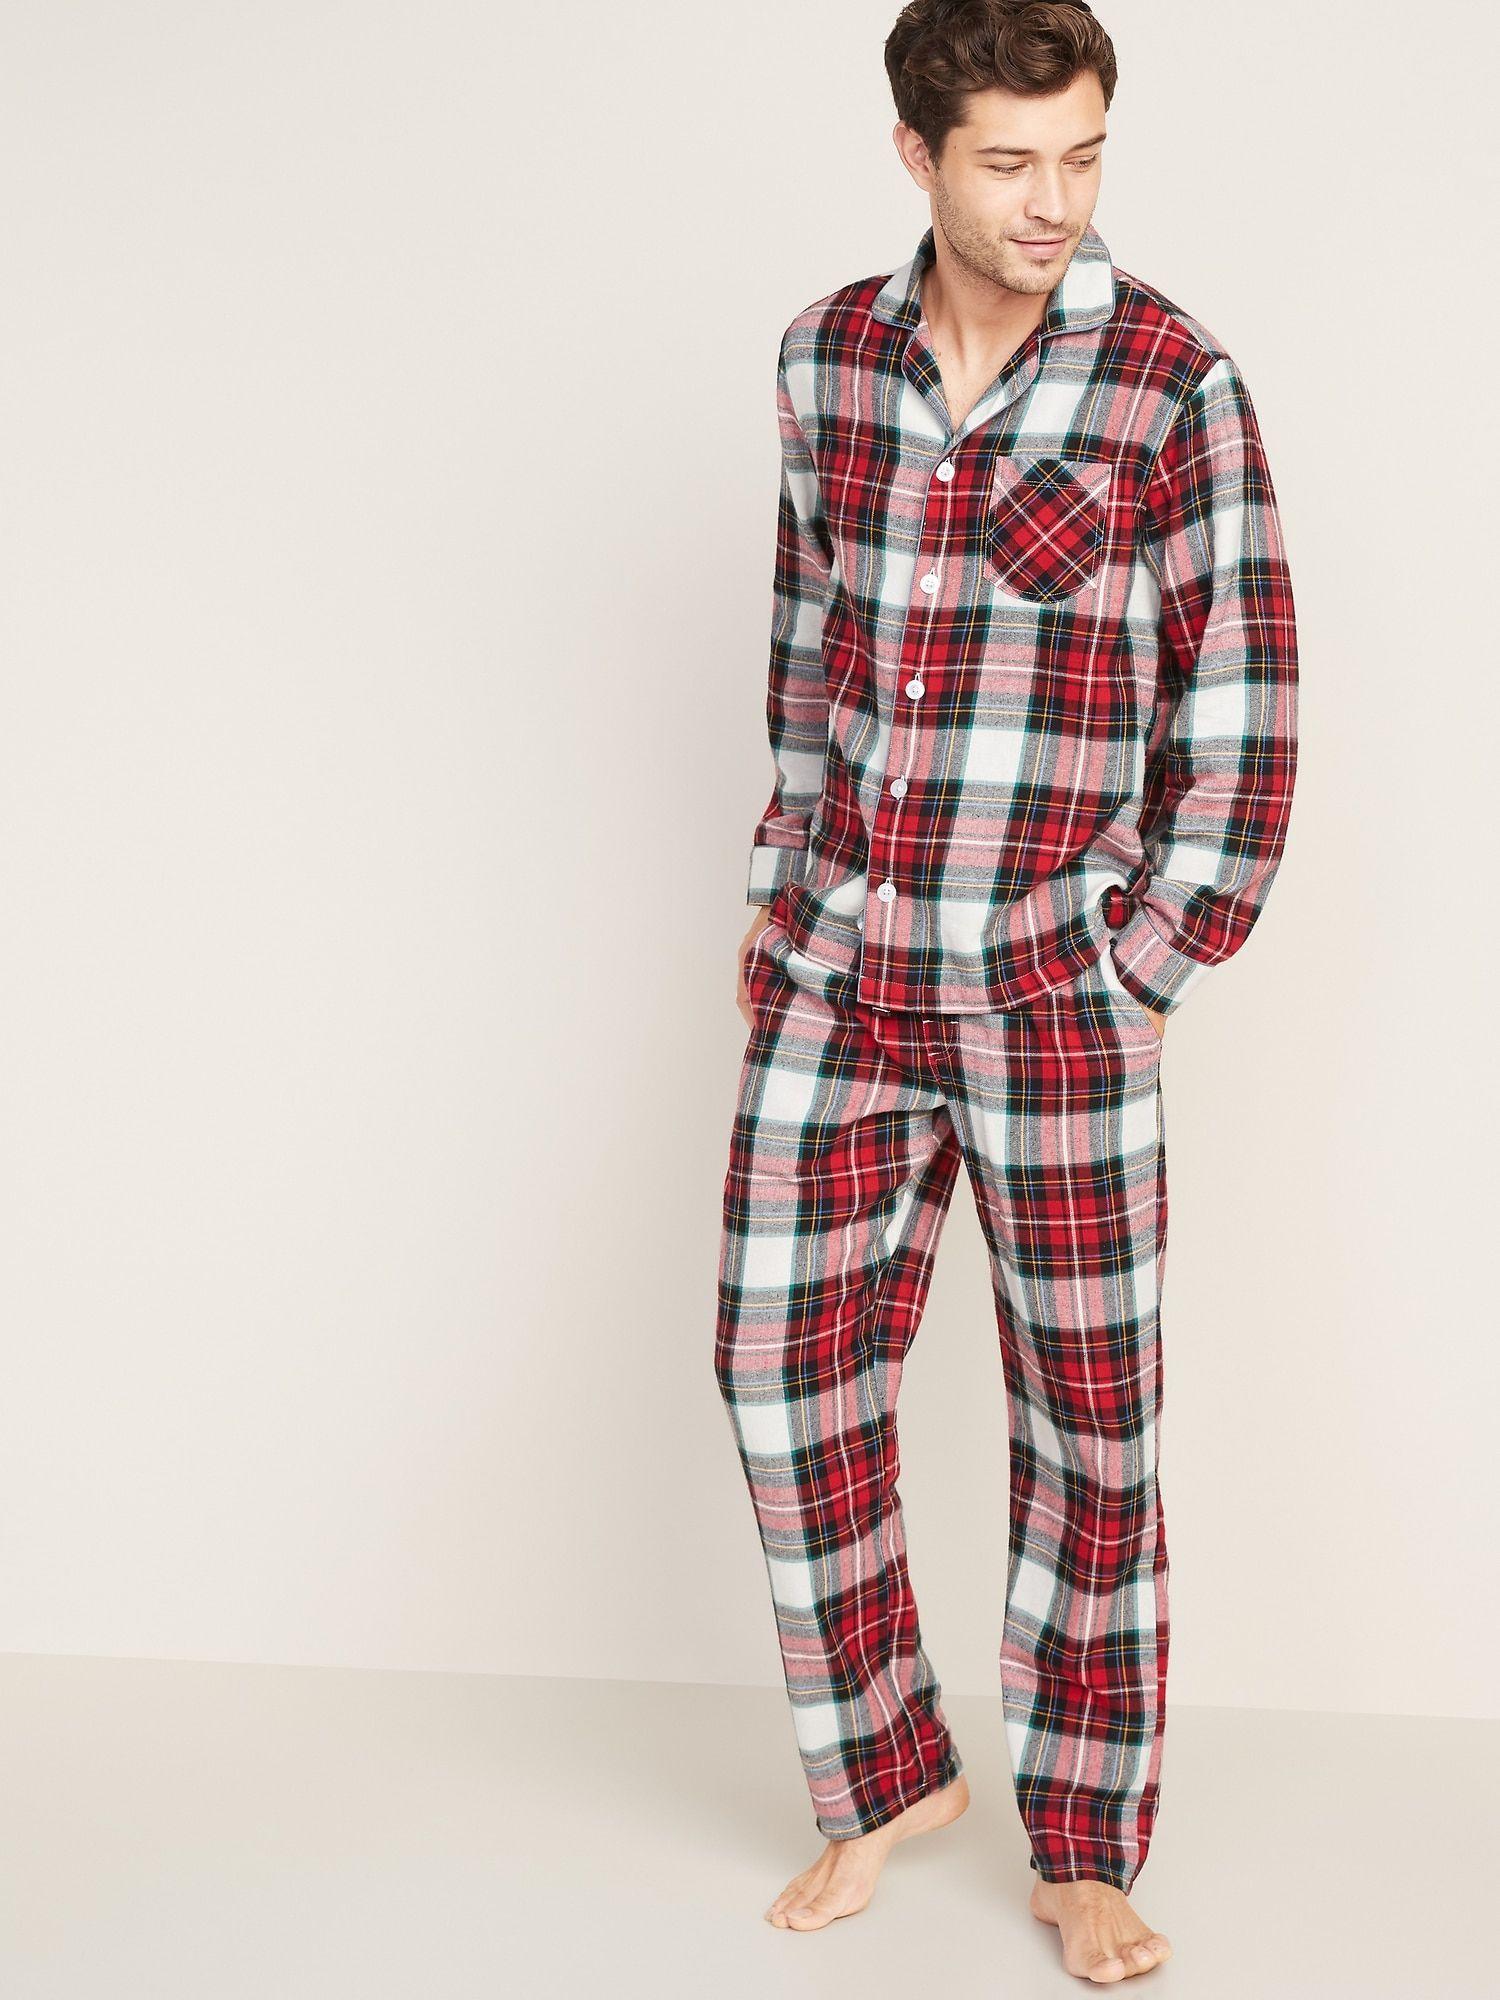 Patterned Flannel Pajama Set for Men Old Navy in 2020